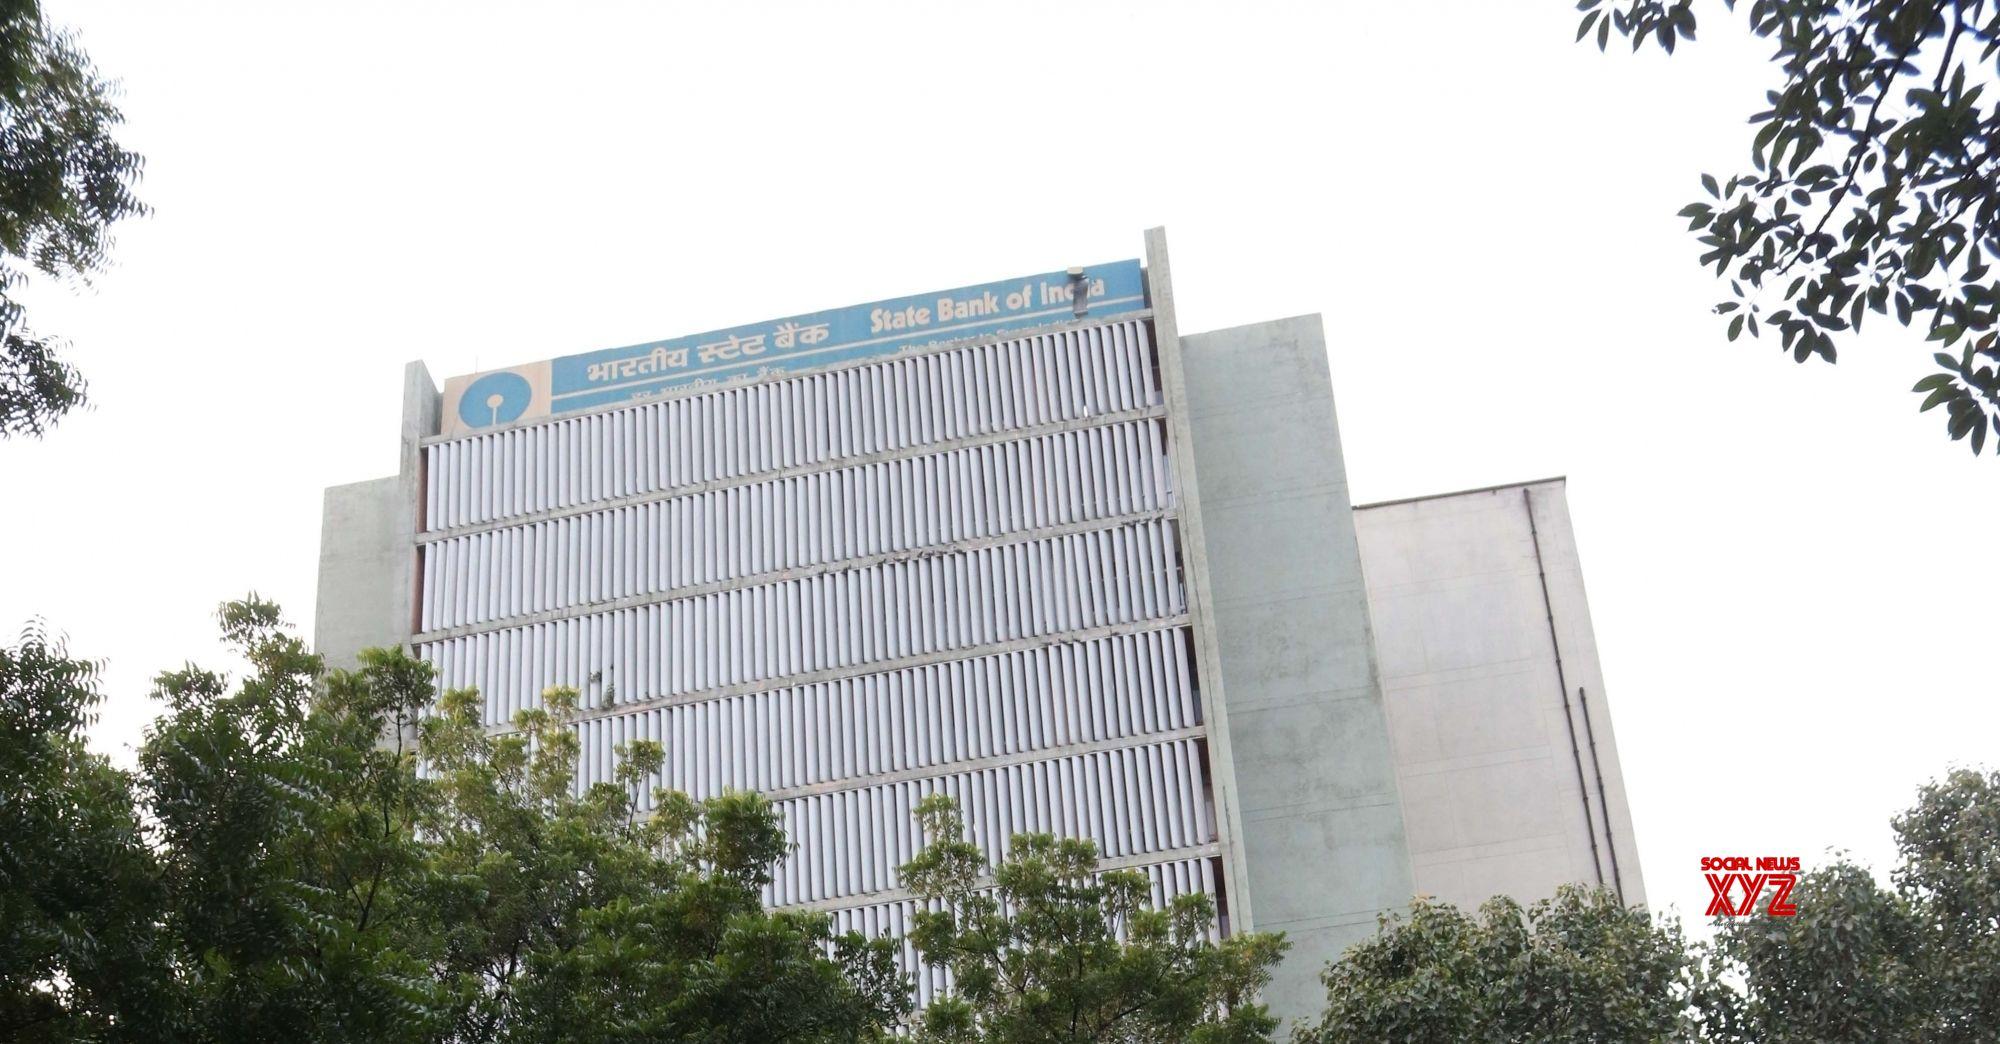 SBI gets shareholders' nod to raise Rs 20,000 crore